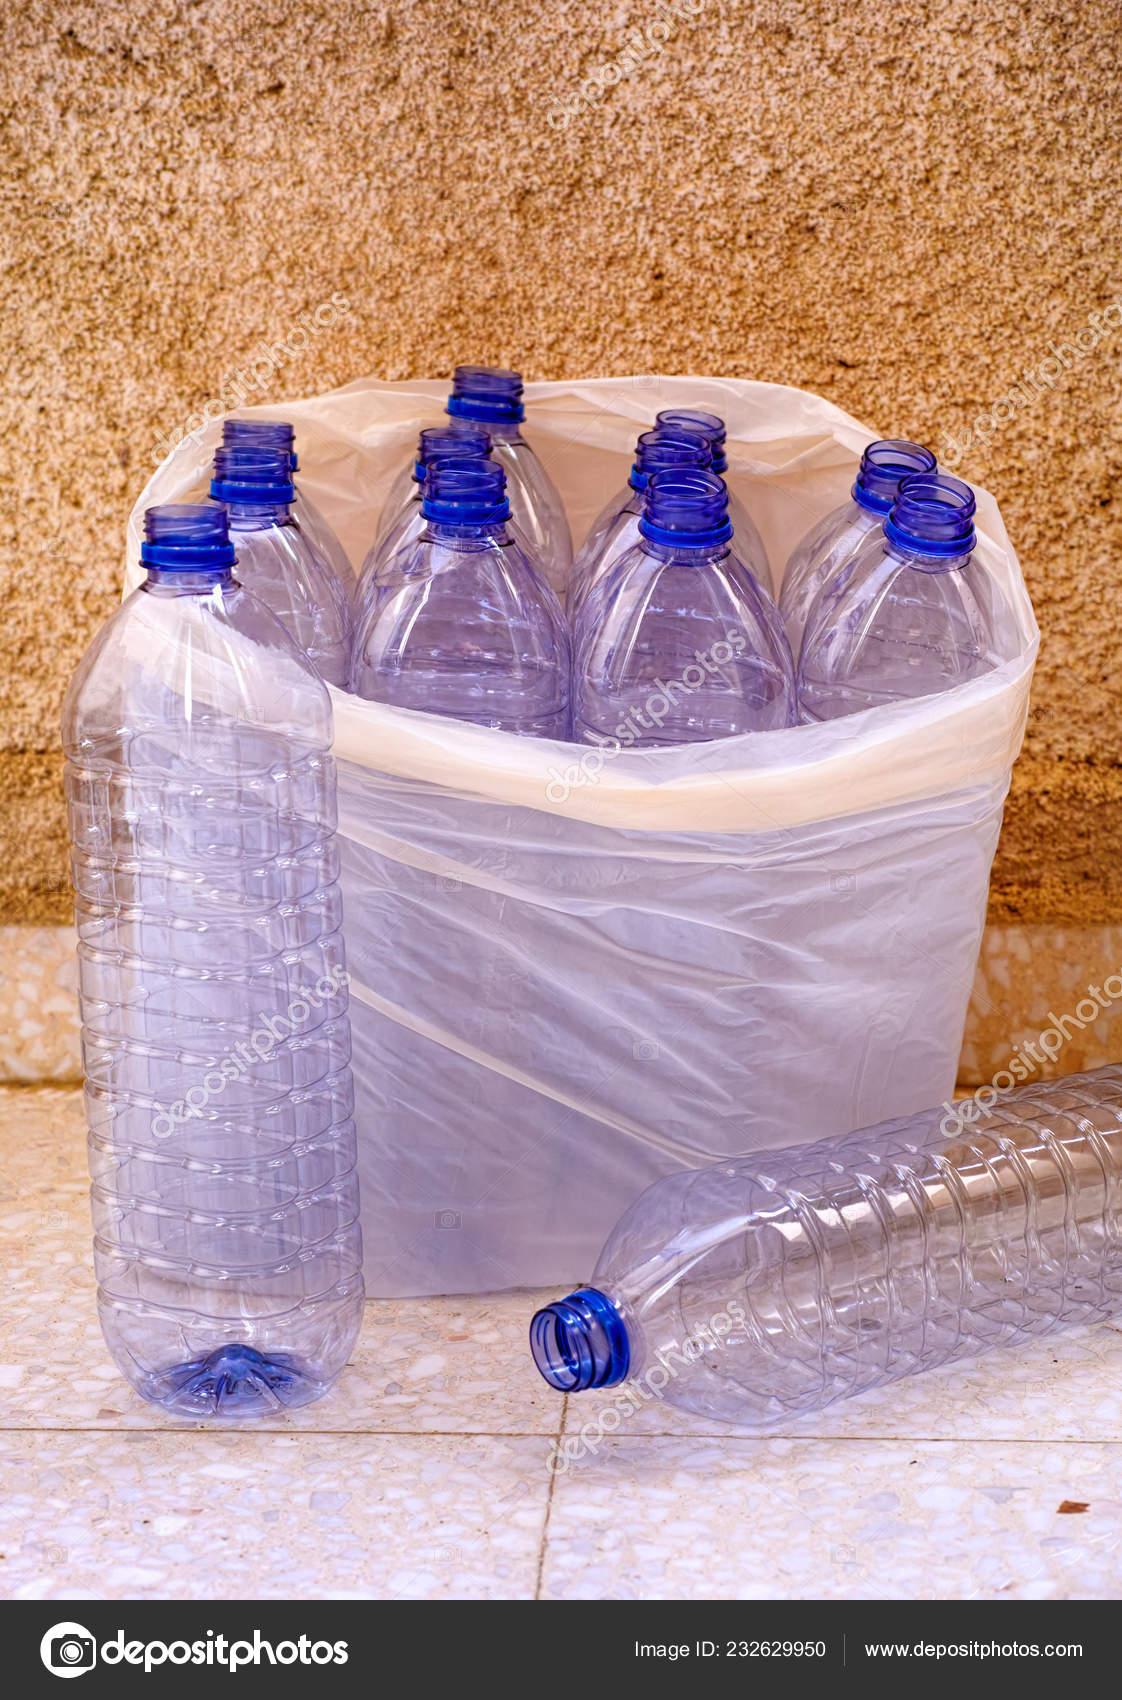 https fr depositphotos com 232629950 stock photo empty plastic bottles plastic bag html